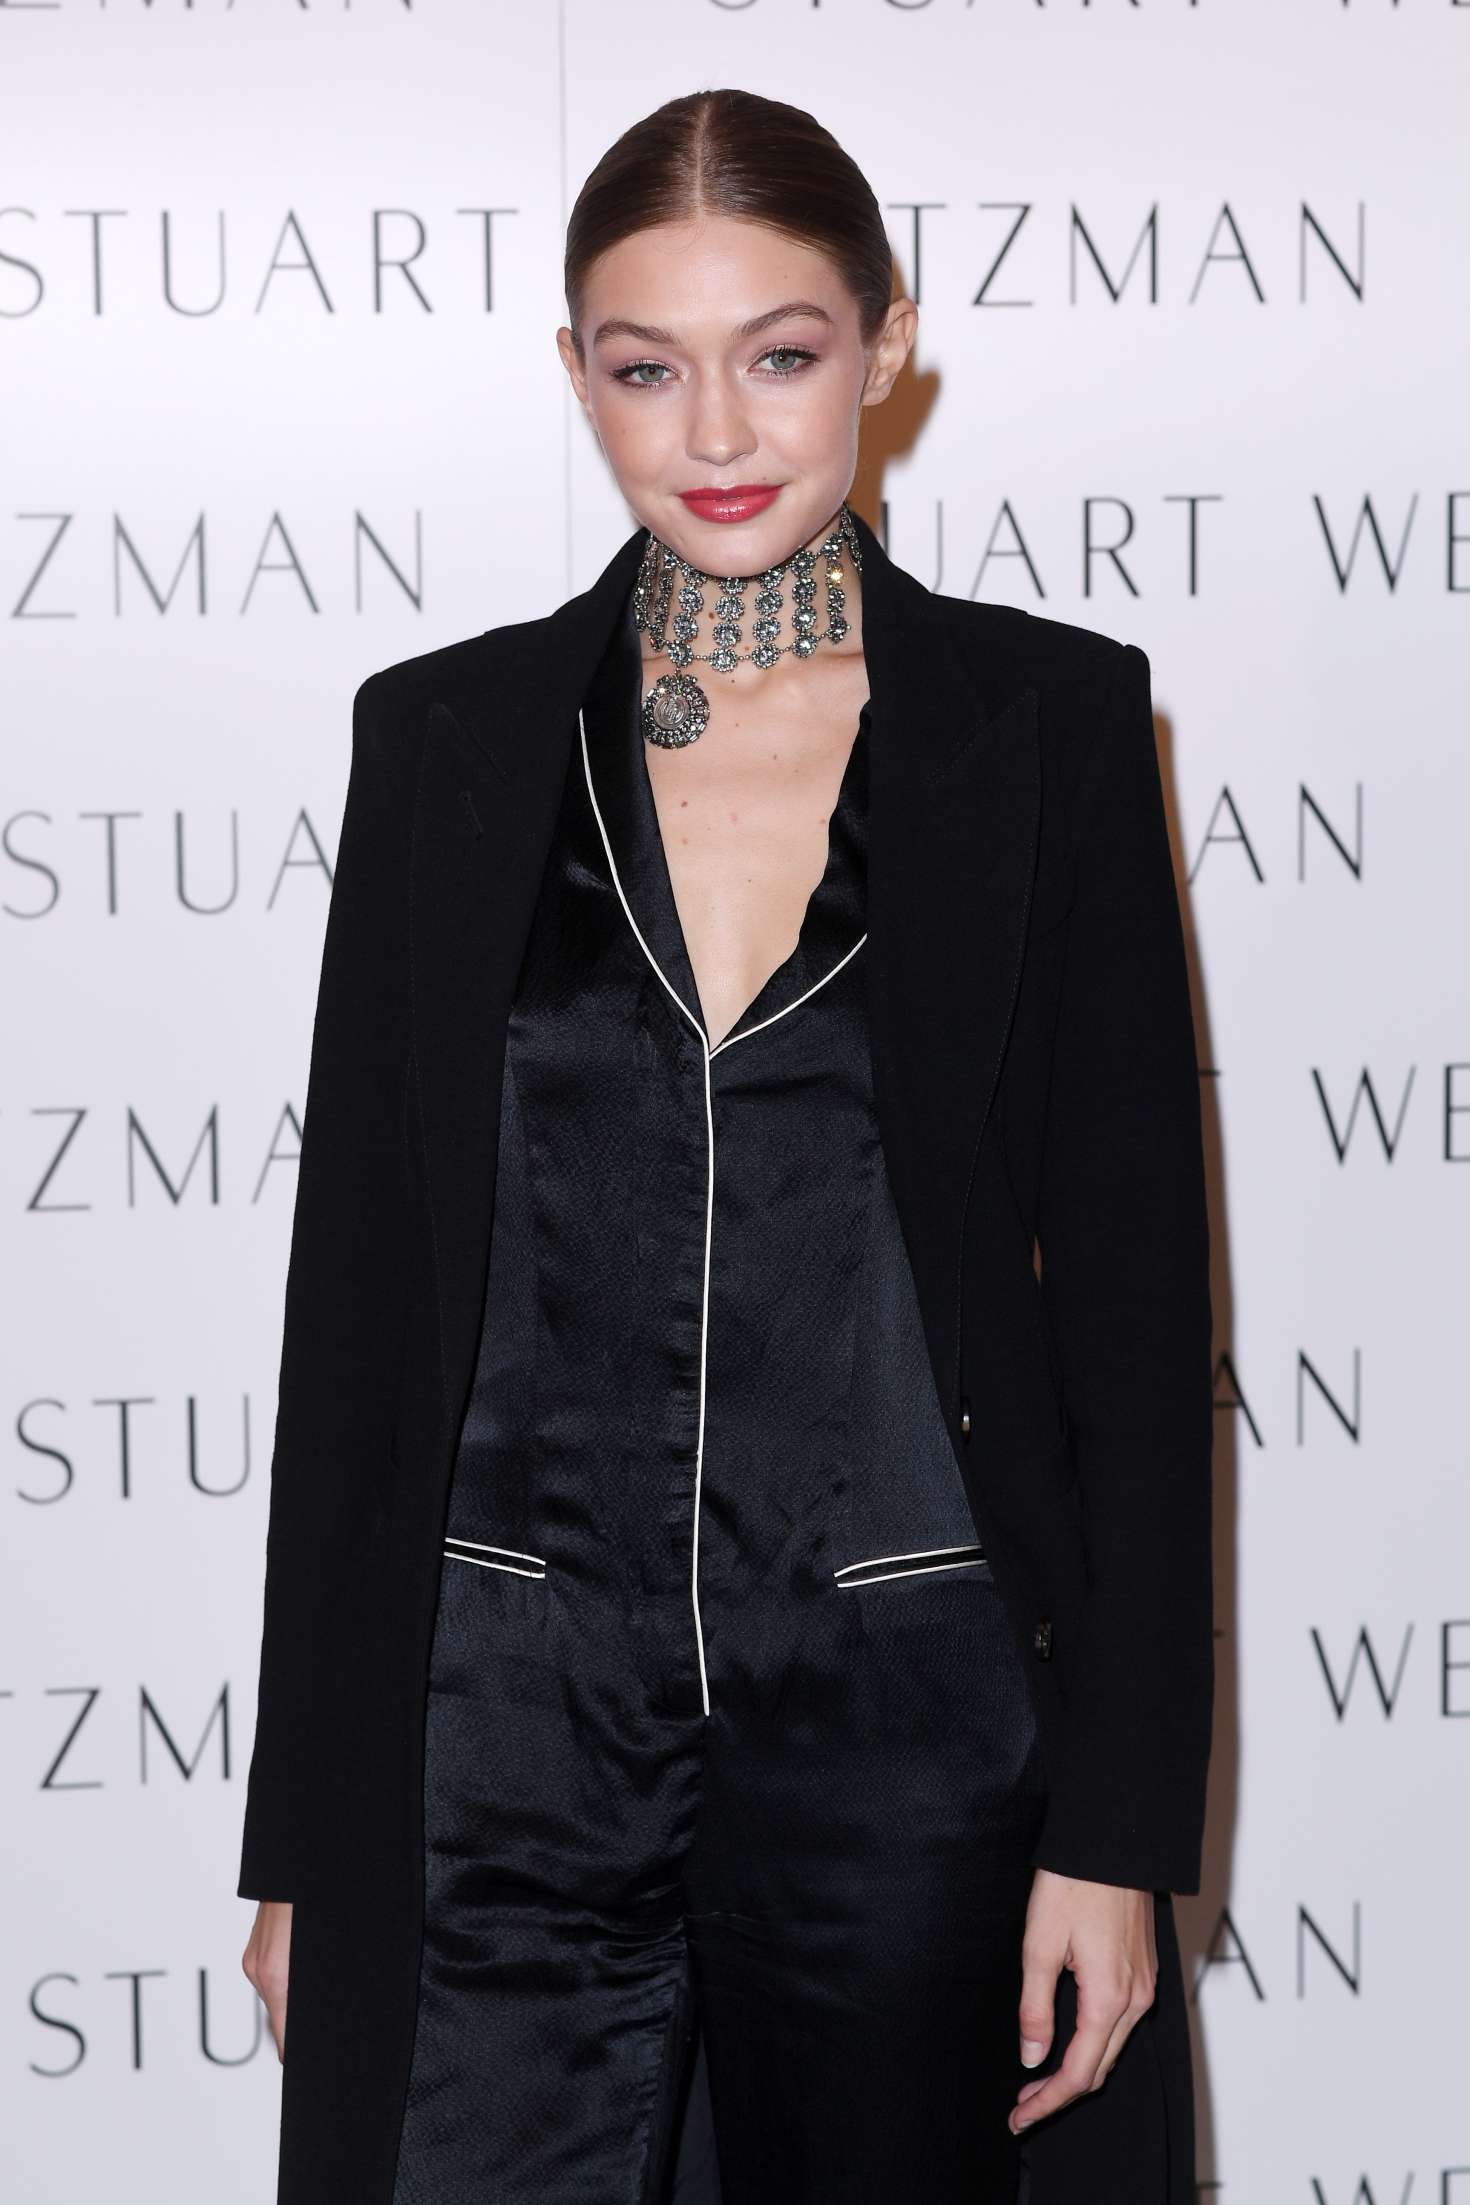 Gigi Hadid - Stuart Weitzman Boutique Opening in London